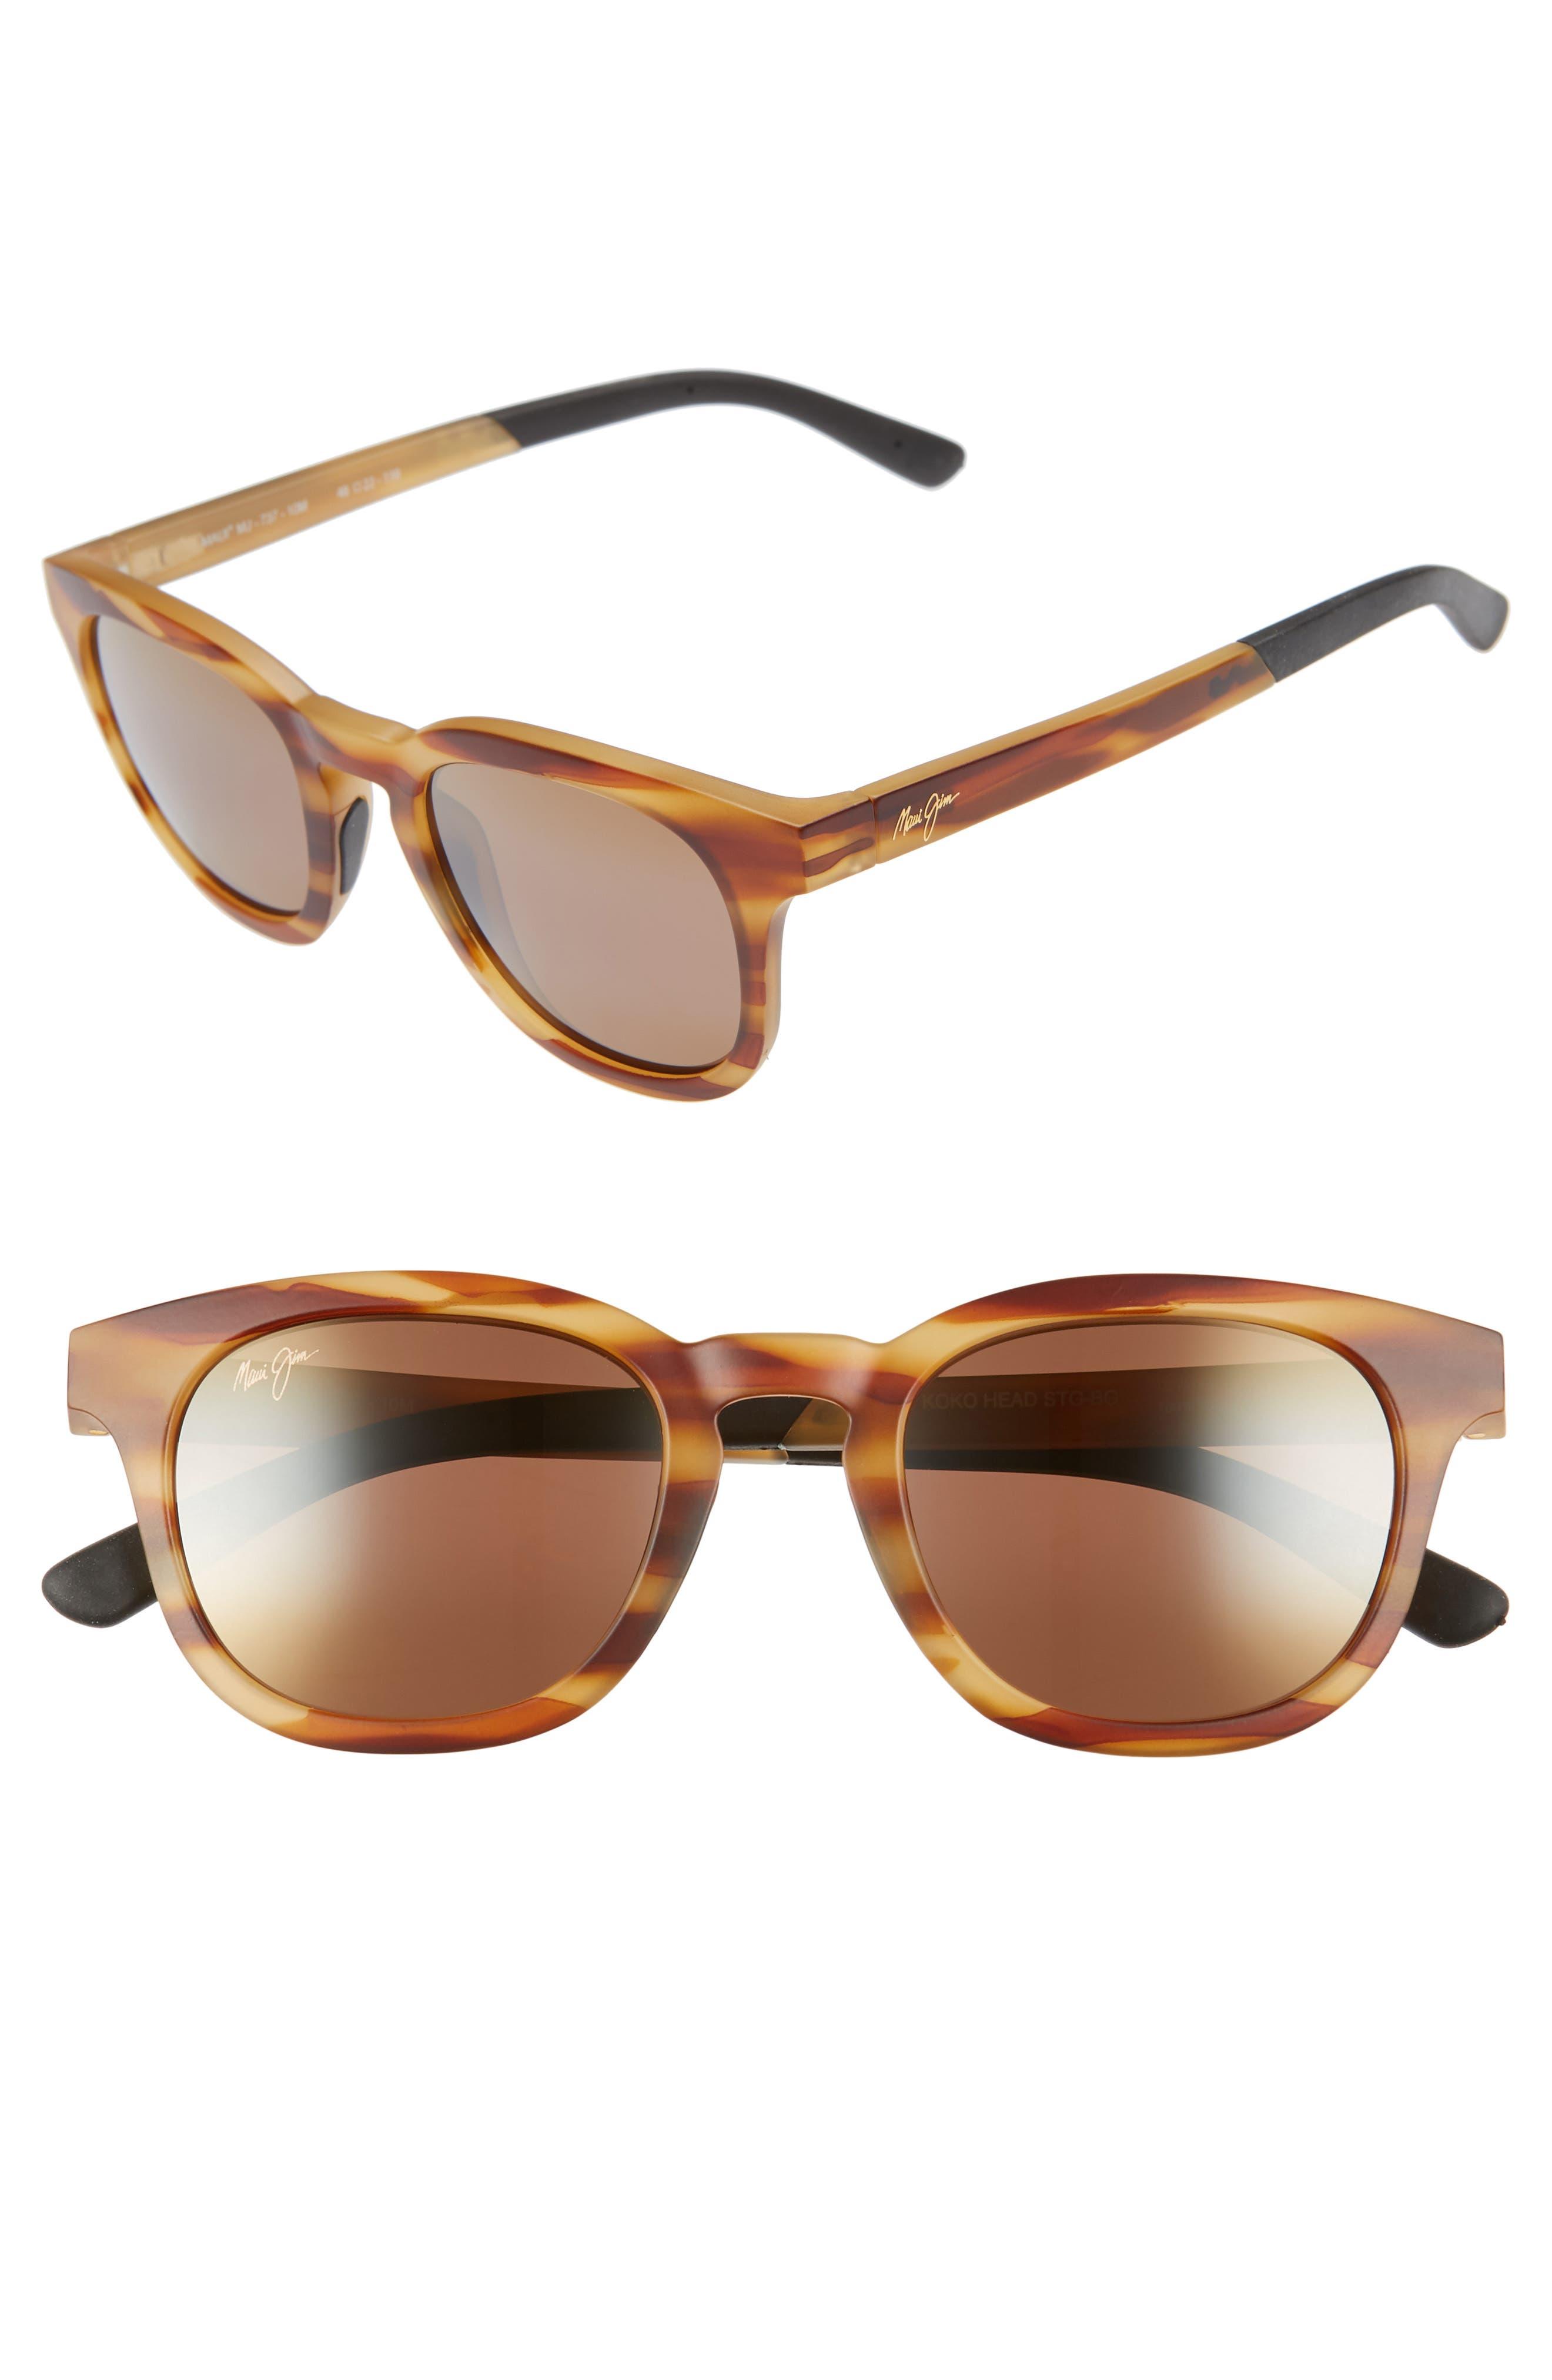 Koko Head 48mm Polarizedplus2 Sunglasses